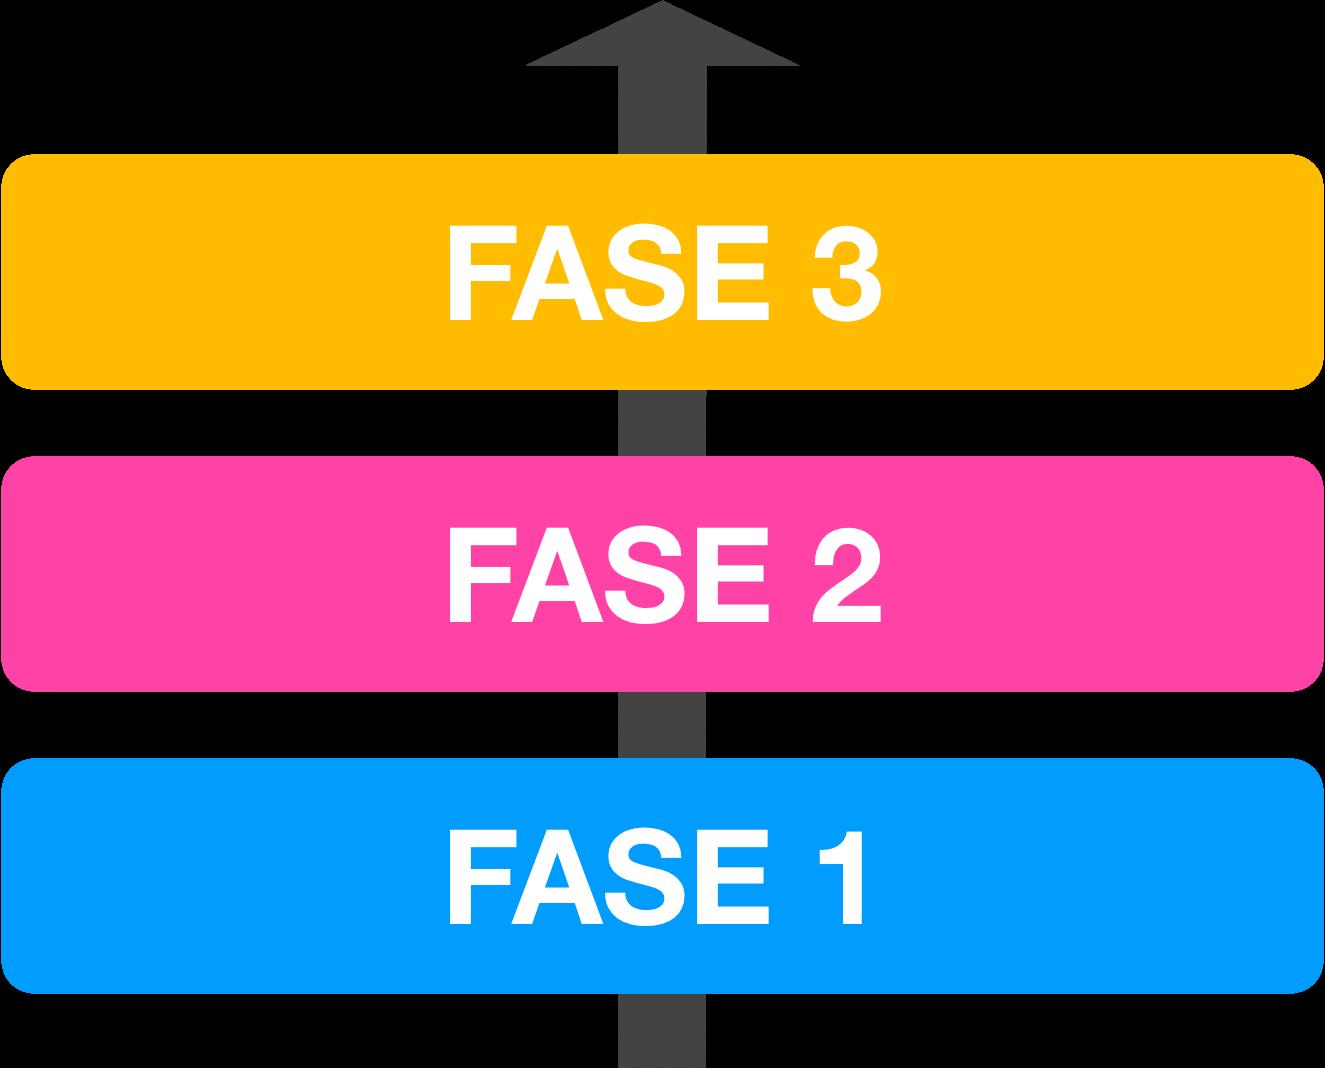 3 fases do estudo pra passar em vestibulares concorridos